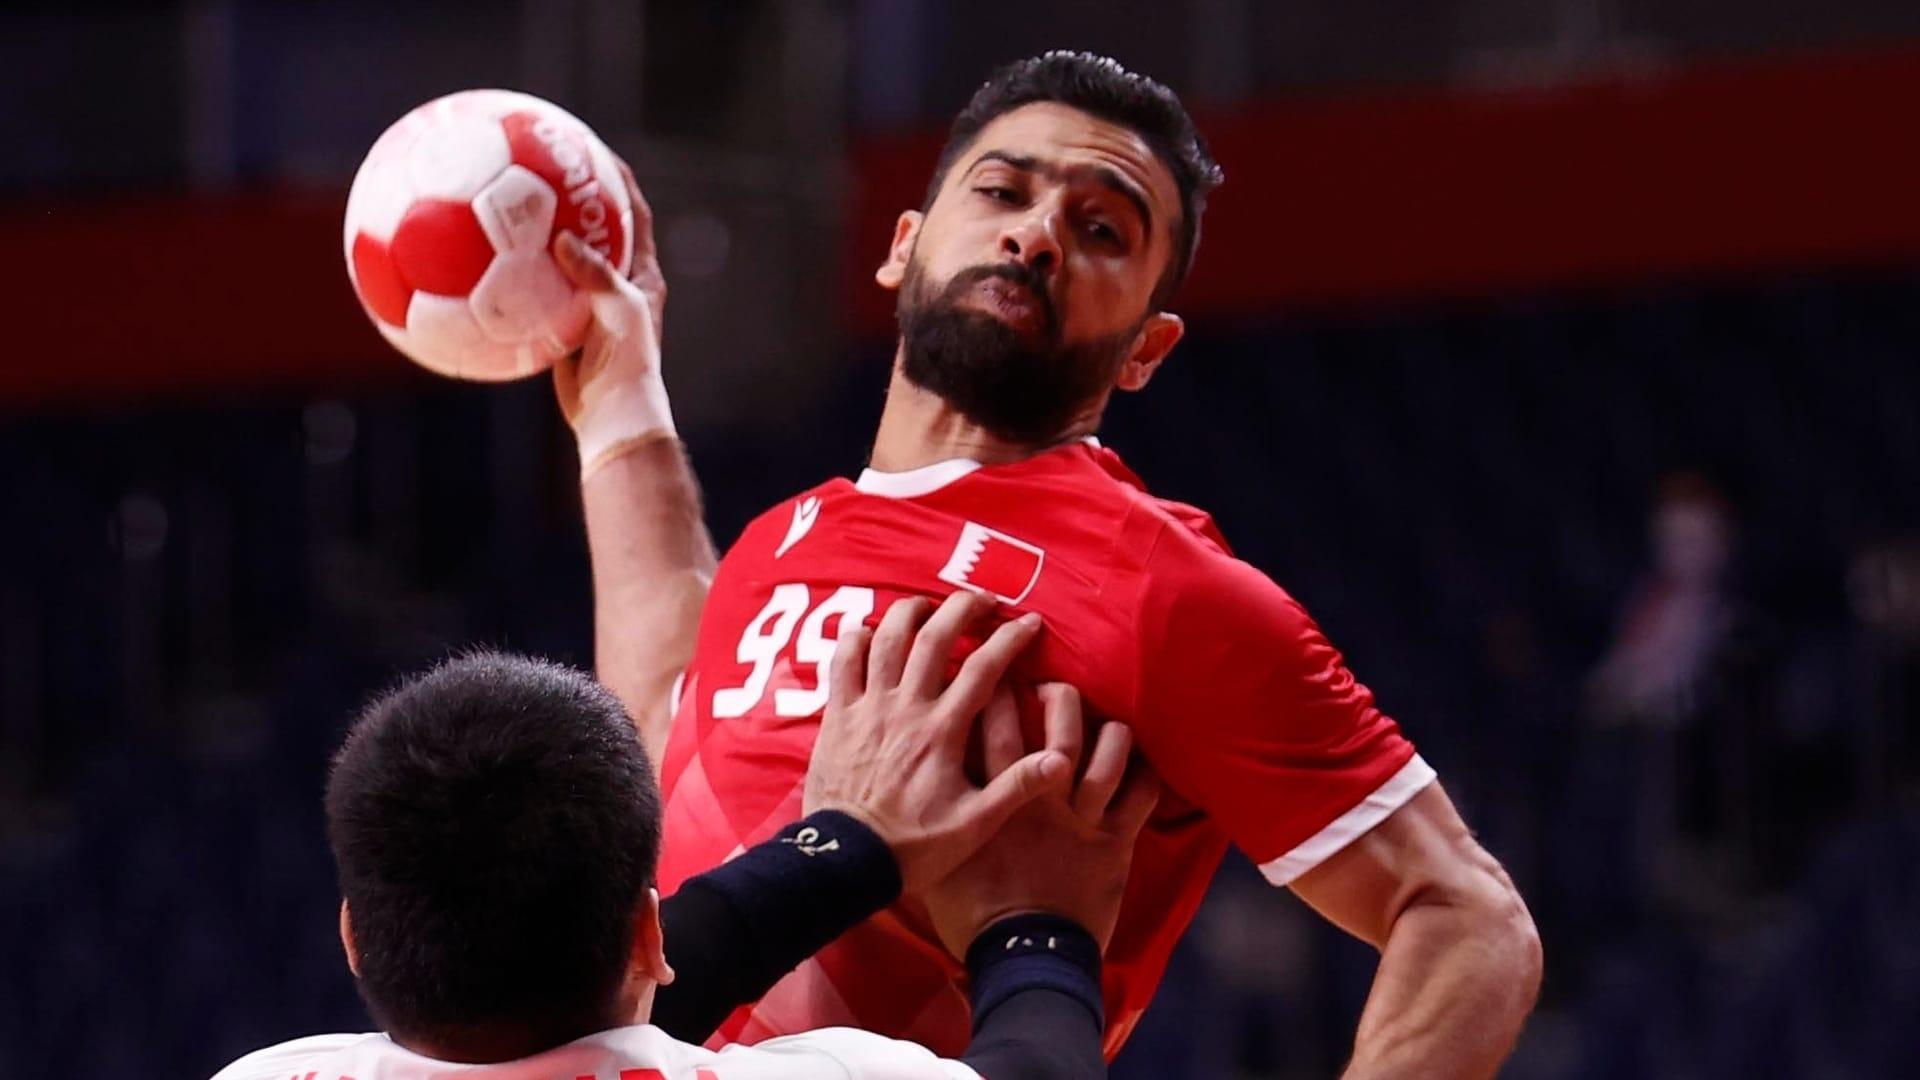 Image for France drops 42 goals on way to men's handball semifinals